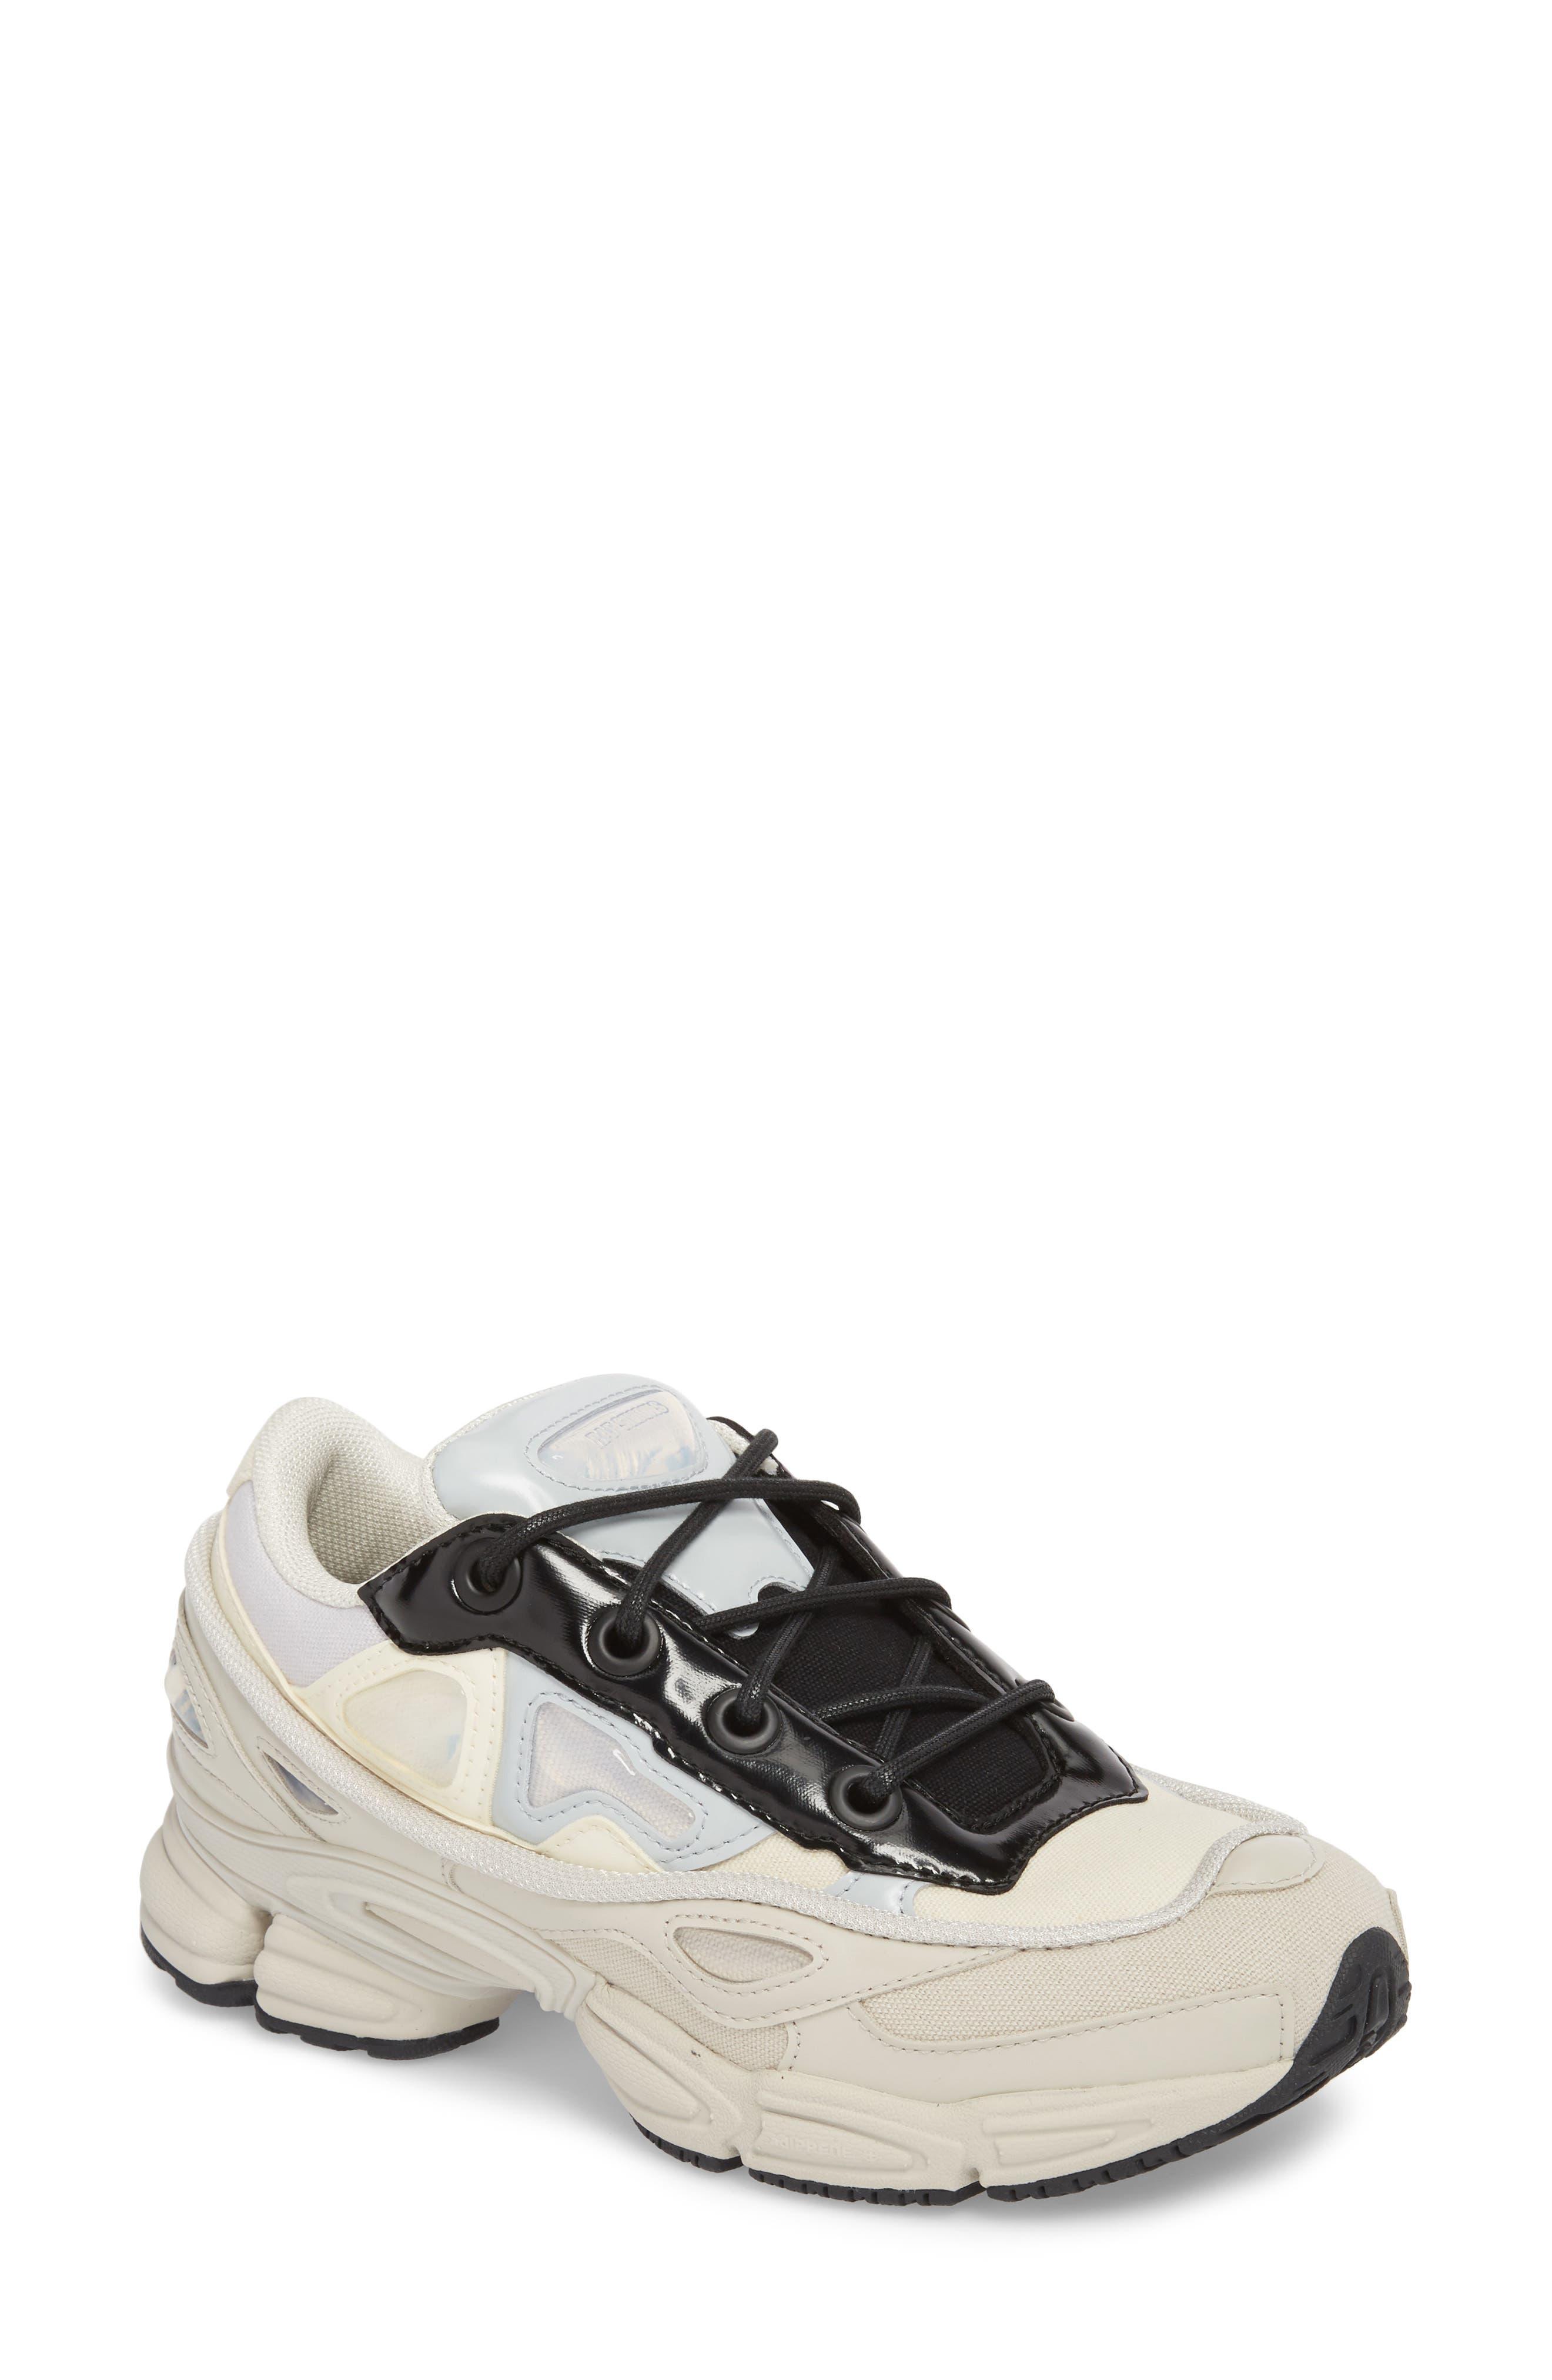 adidas by Raf Simons Ozweego III Sneaker,                             Main thumbnail 1, color,                             Cream White/ Mist Stone/ Black